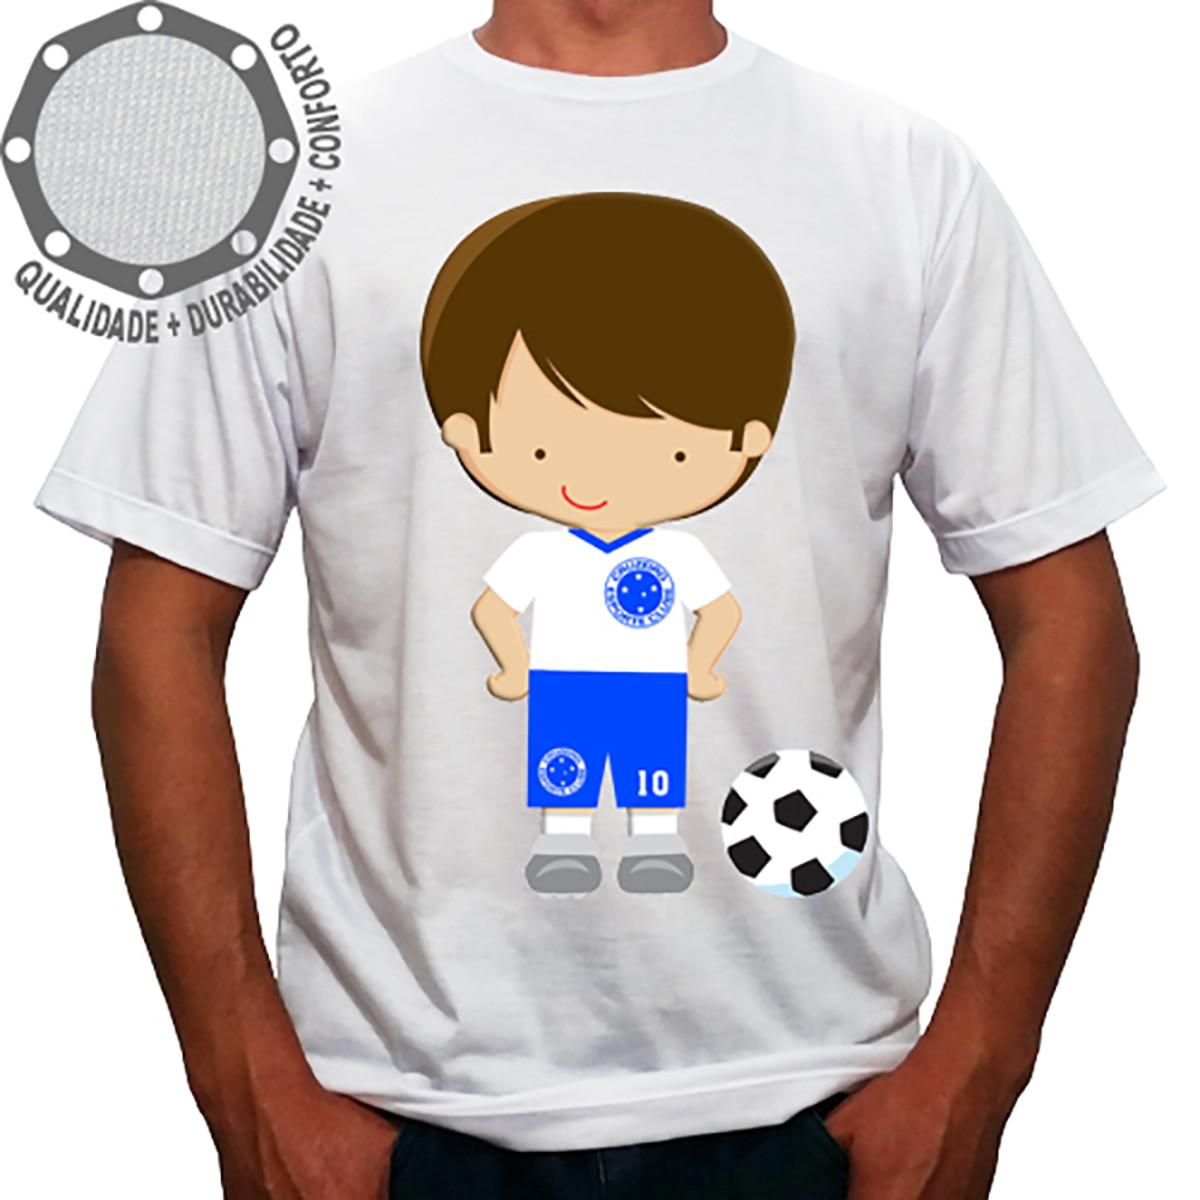 fc9b68b0c1c21 Camiseta Cruzeiro Menino Uniforme Branco no Elo7